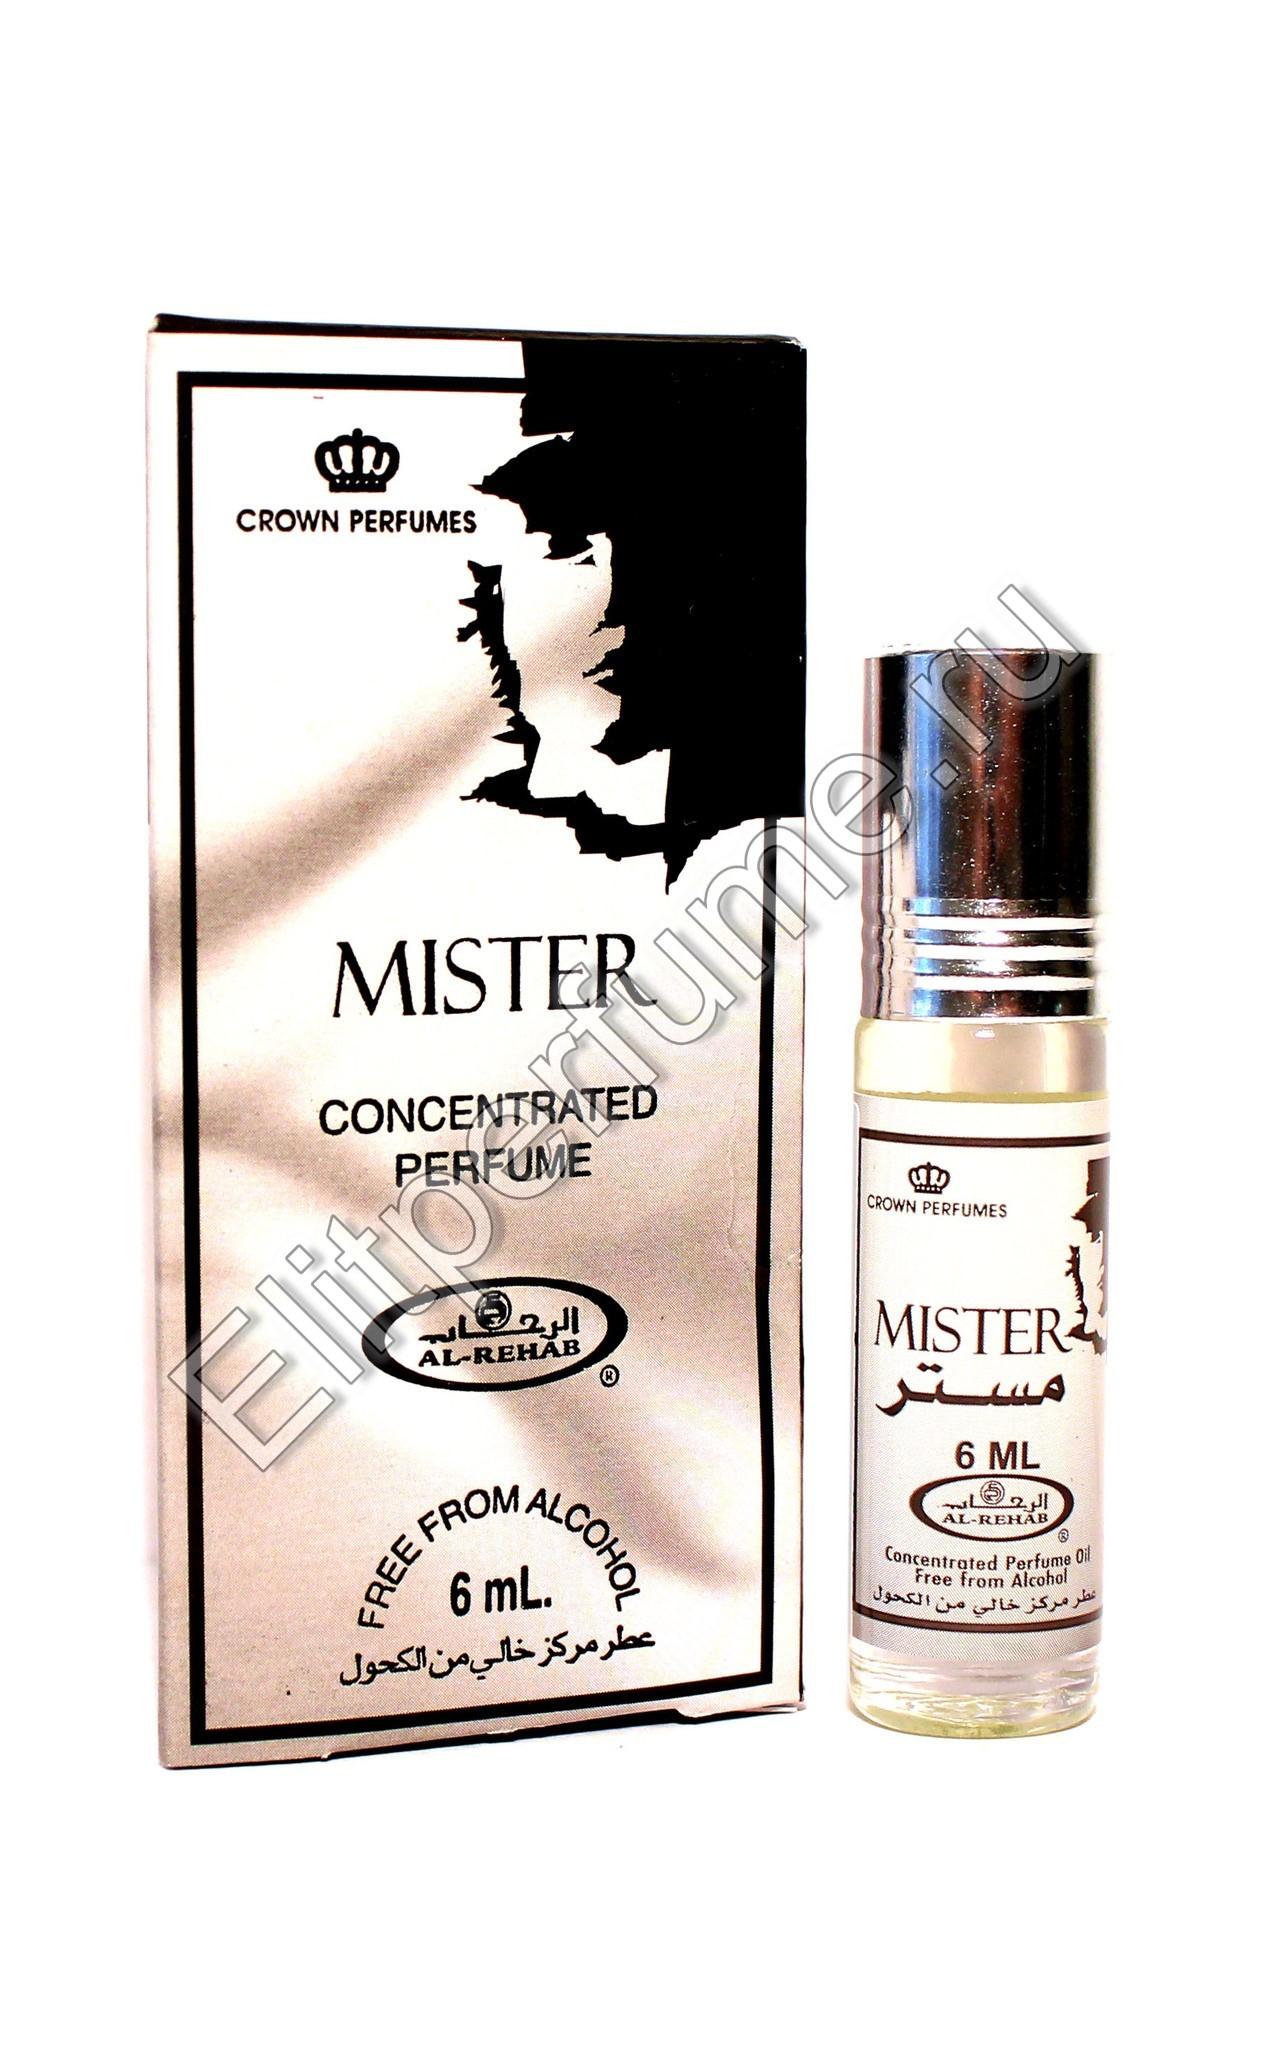 Mister Мистер 6 мл арабские мужские масляные духи от Аль Рехаб Al Rehab